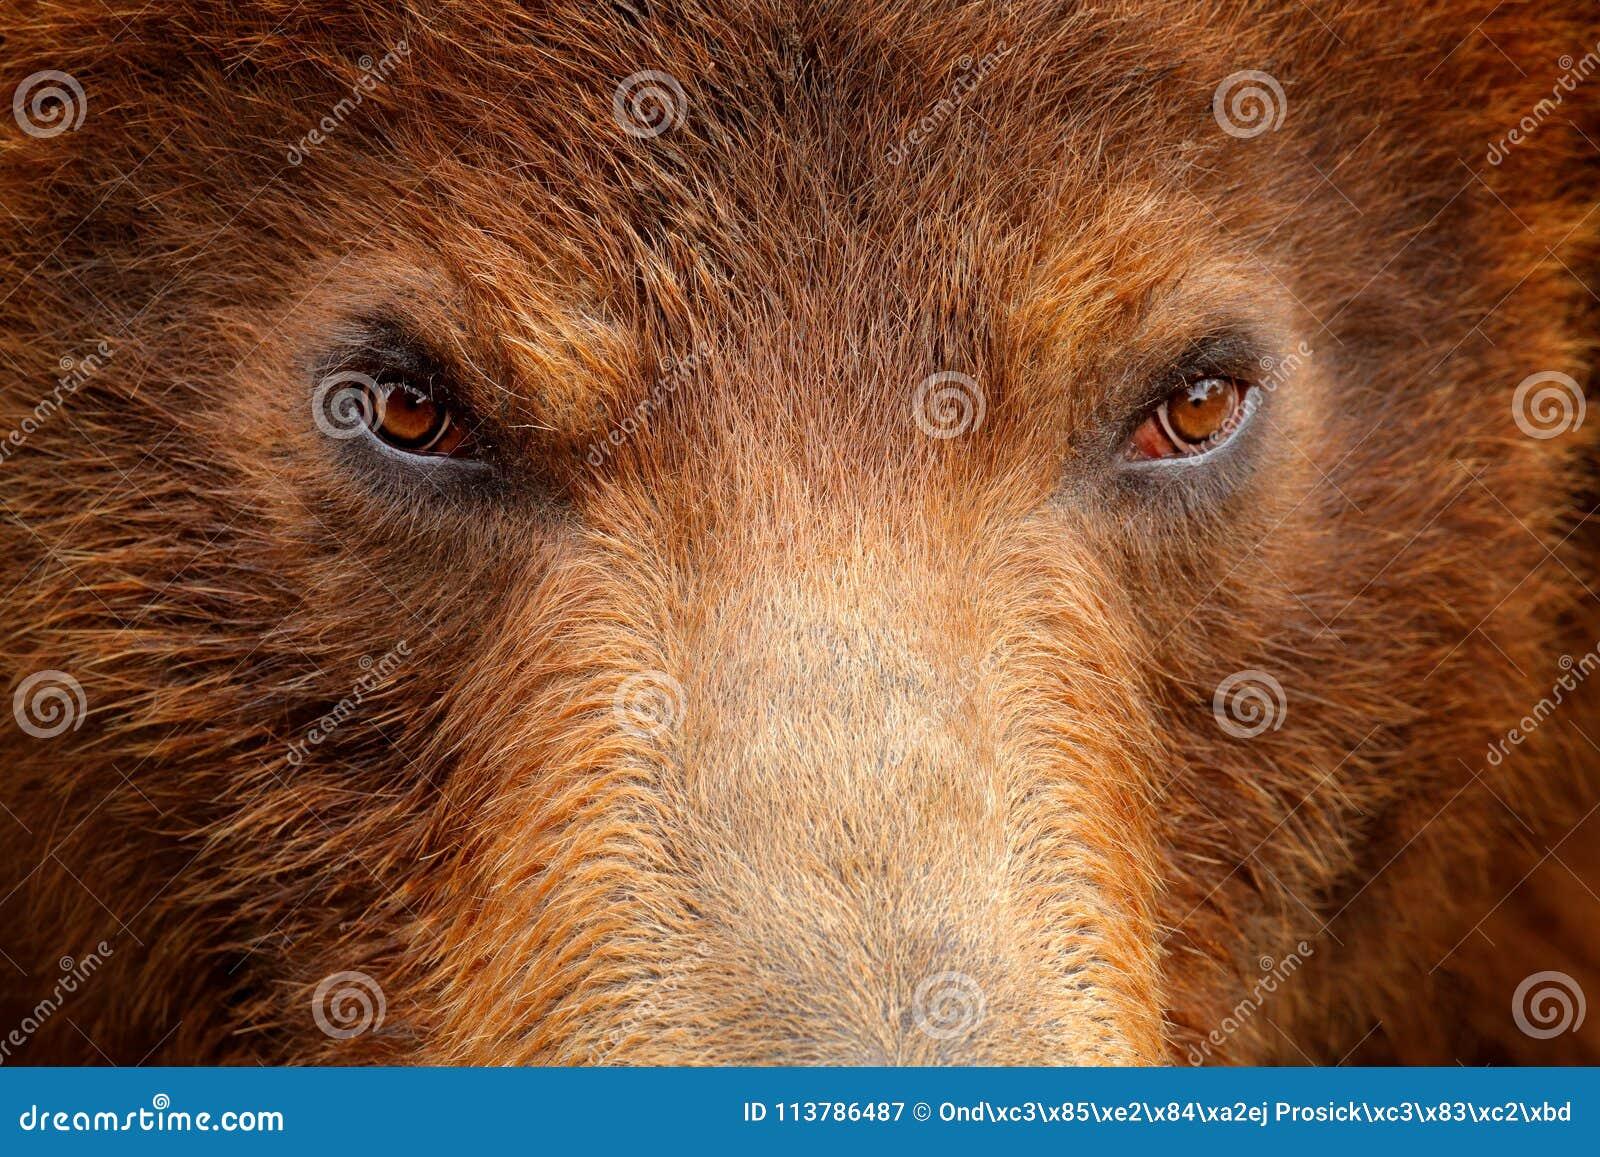 Brown bear, close-up detail eye portrait. Brown fur coat, danger animal. Wildlife nature. Fixed look, animal muzzle with eyes. Big